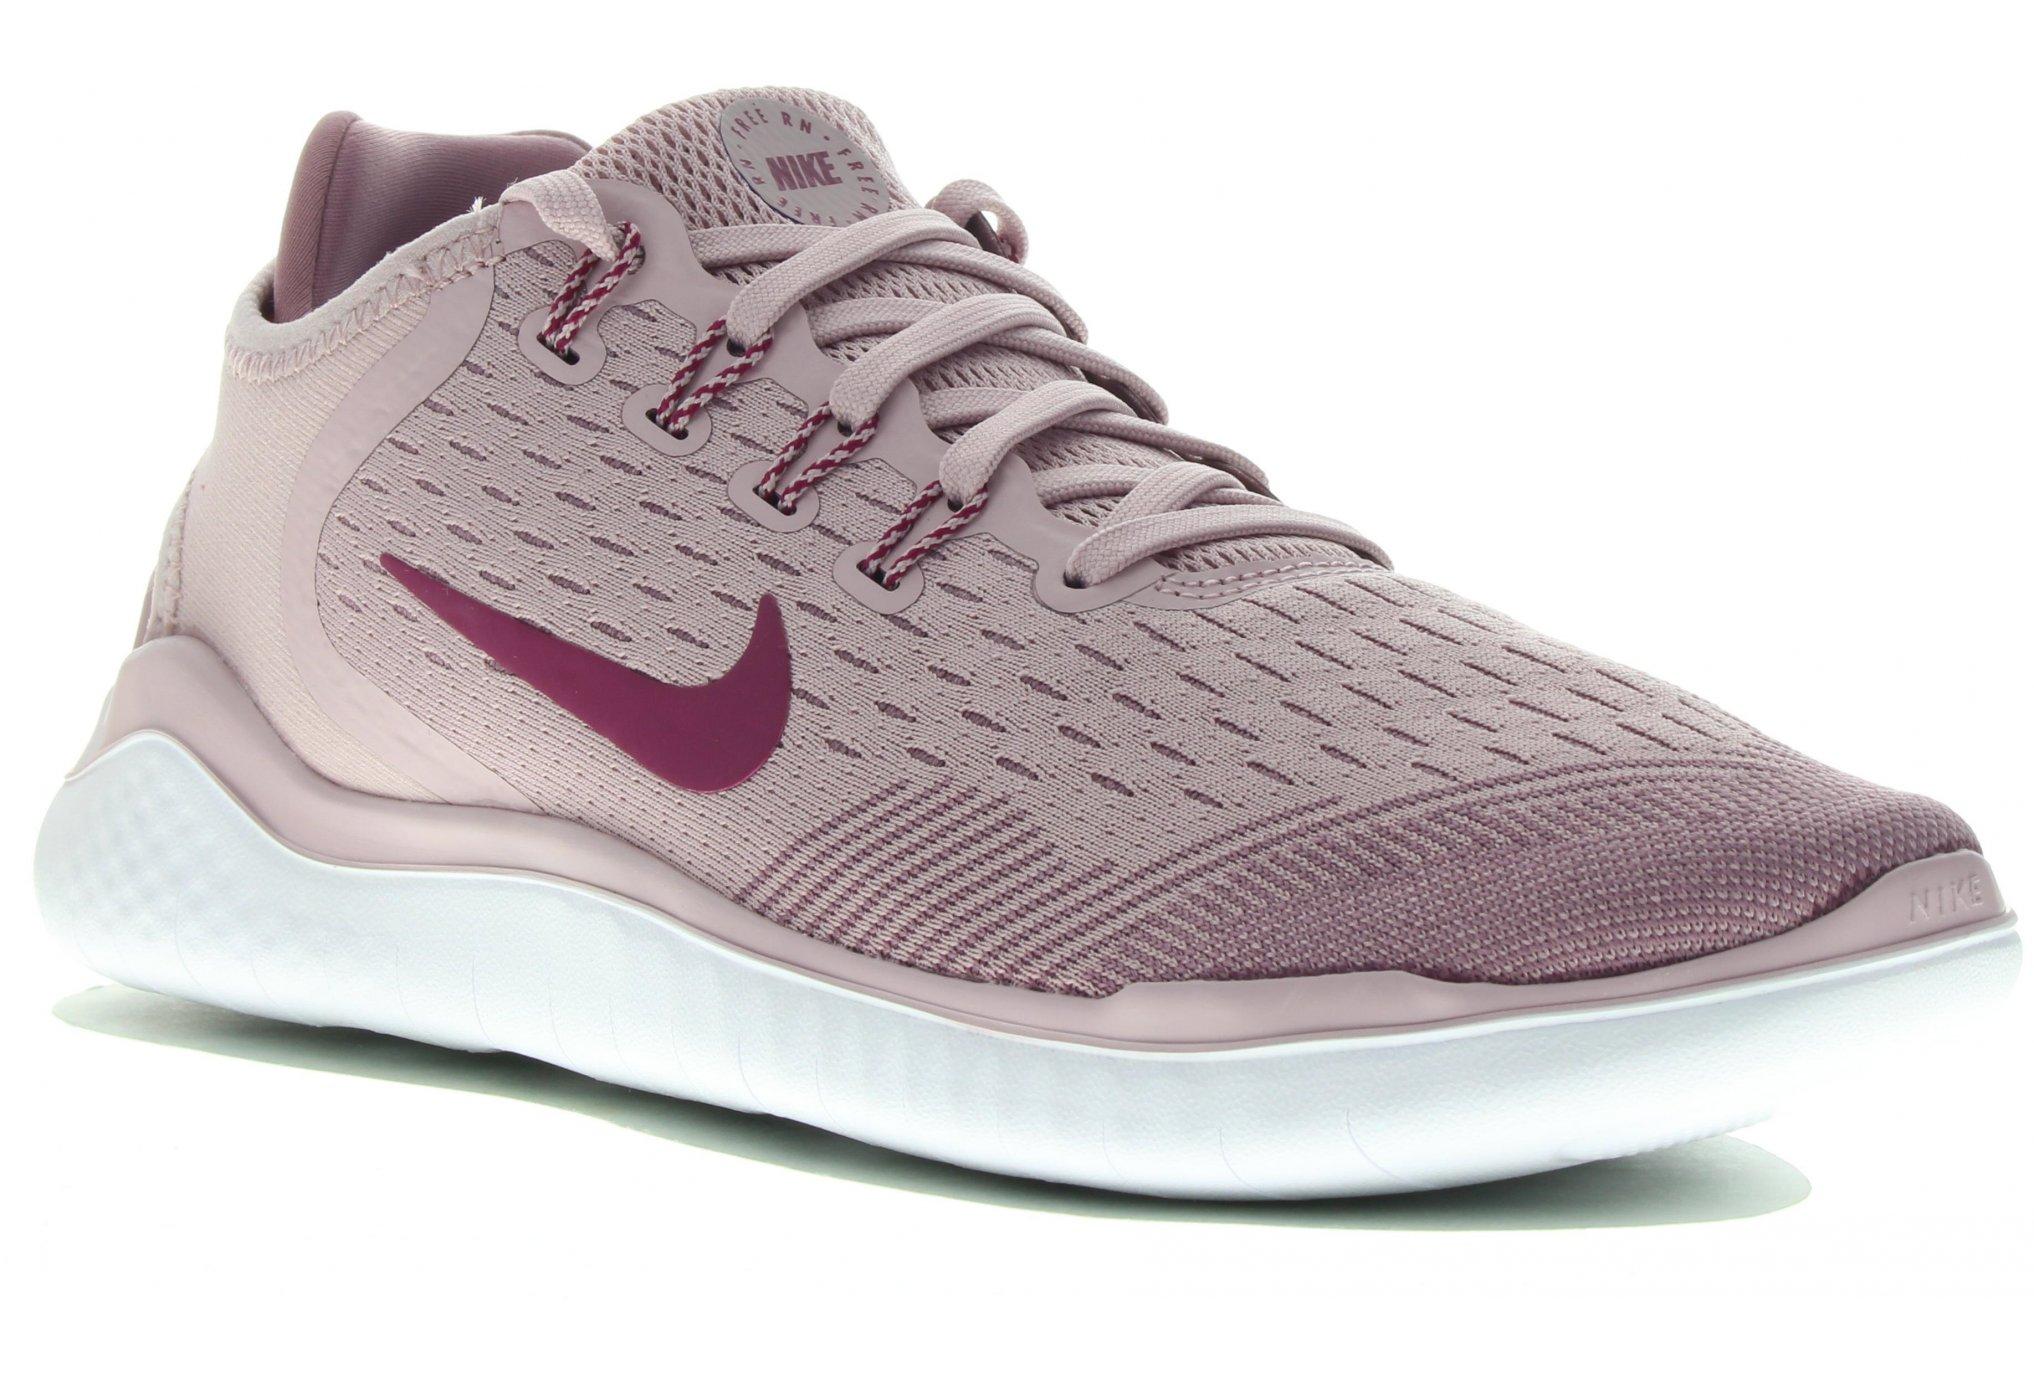 Nike Free RN déstockage running